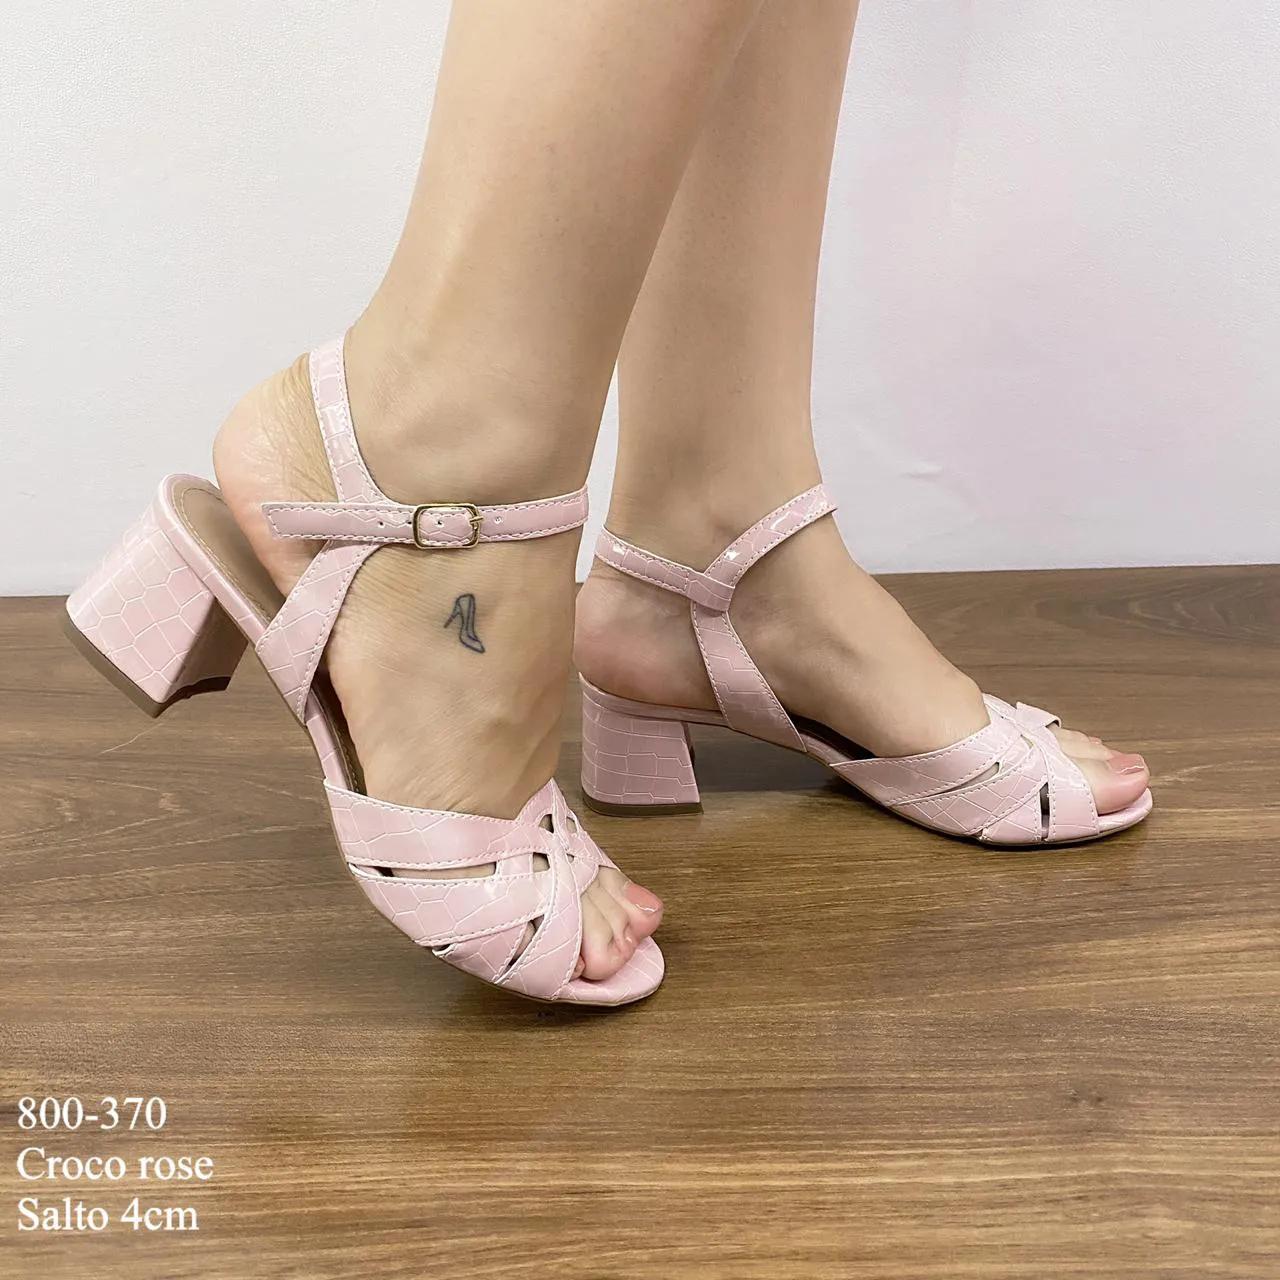 Sandália Rose Croco Salto Bloco | D-800-370